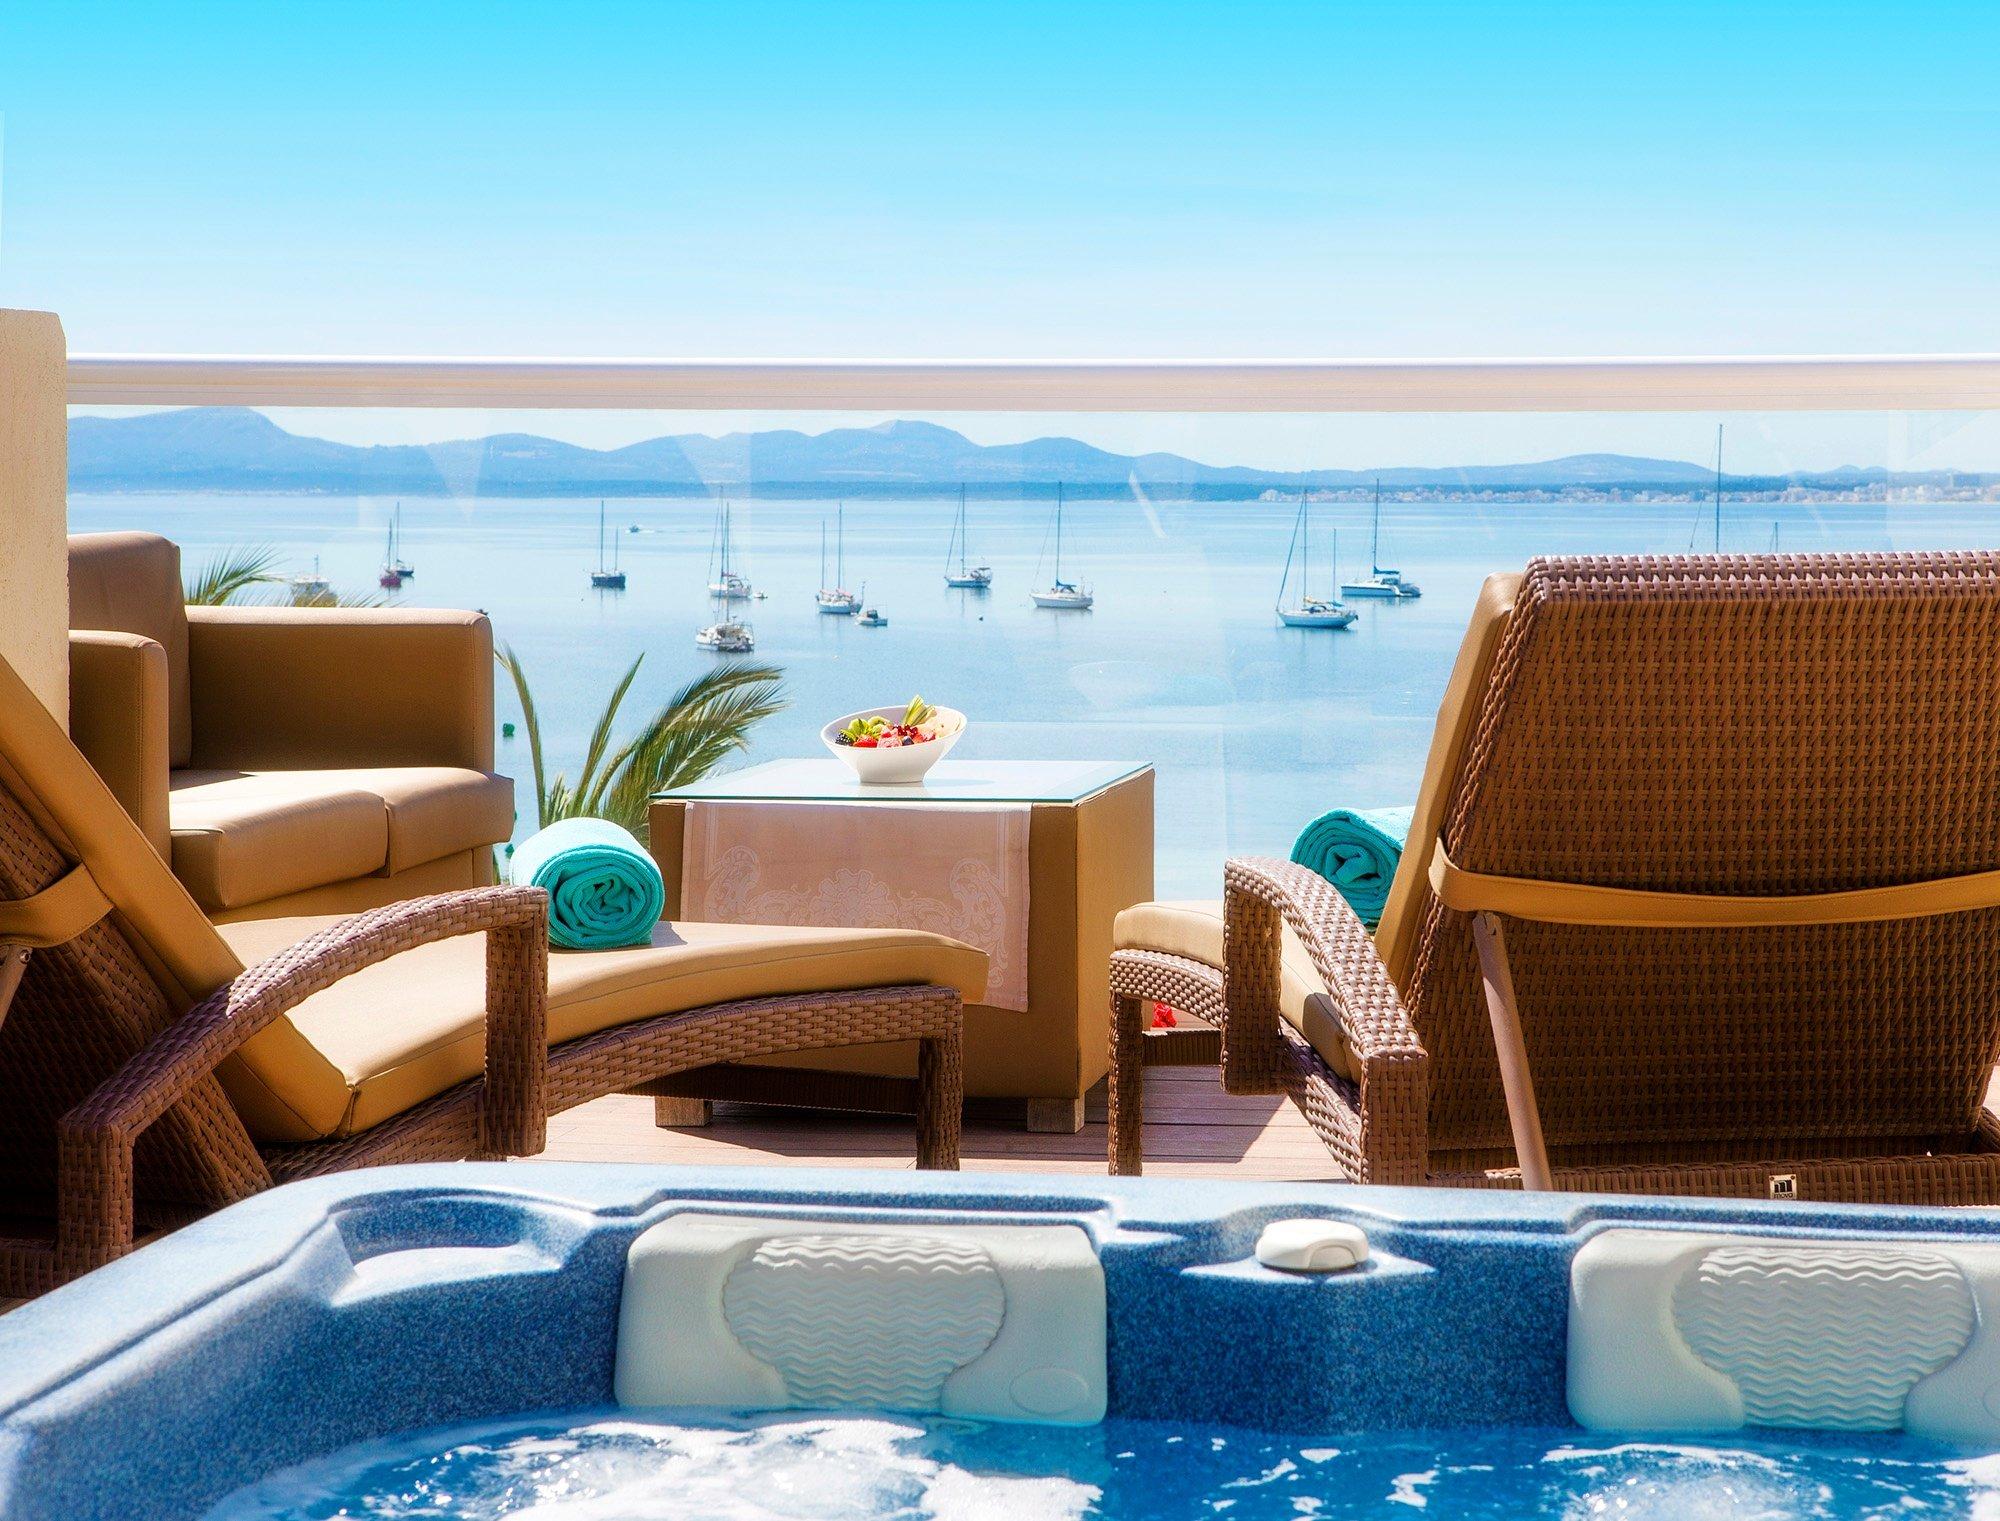 terrace royal terrace vanity golf.jpg